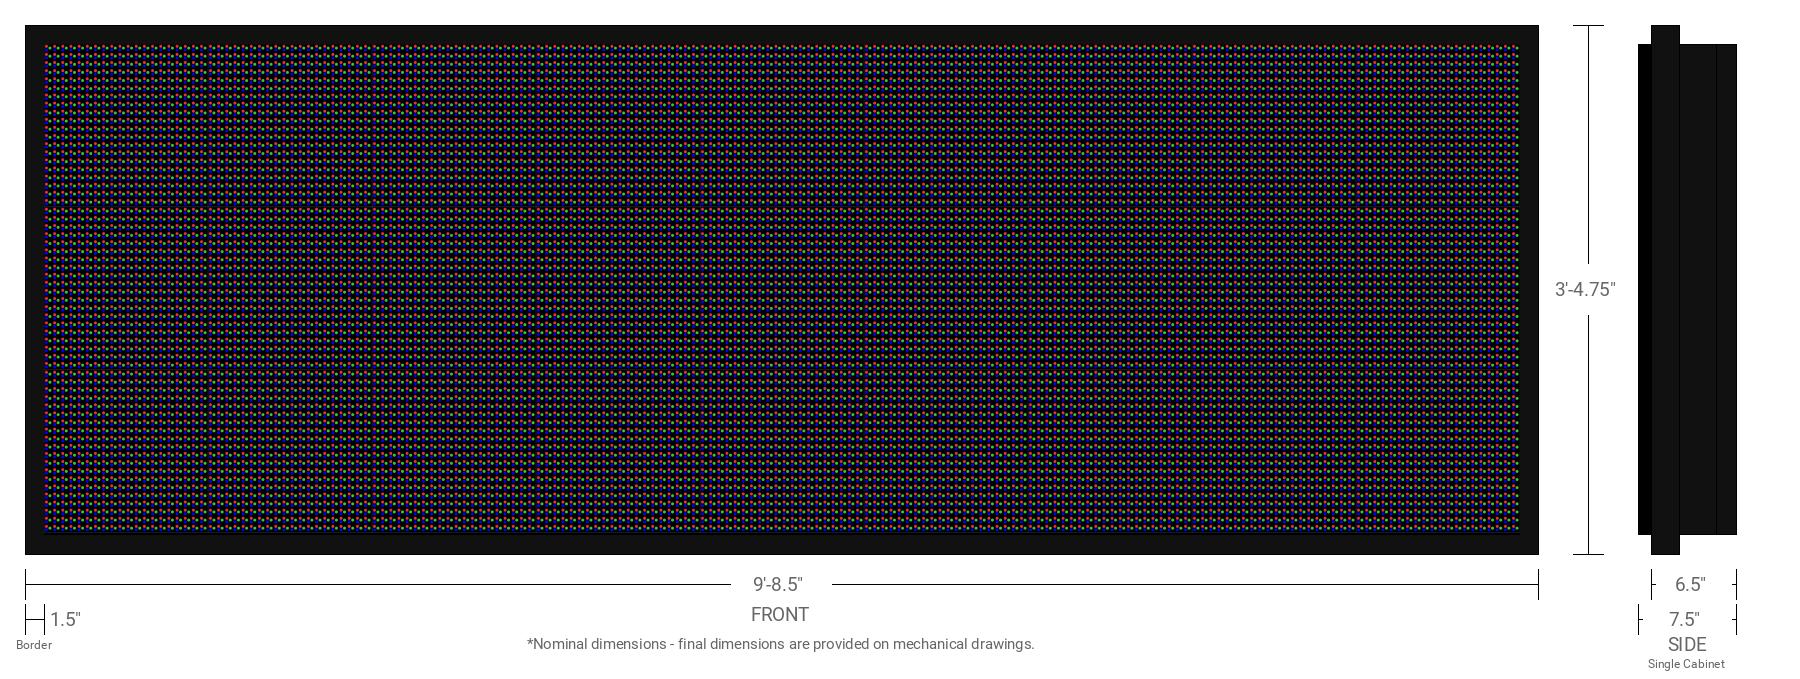 Aurora 16mm 60x180 Single Sided Full Color LED Display